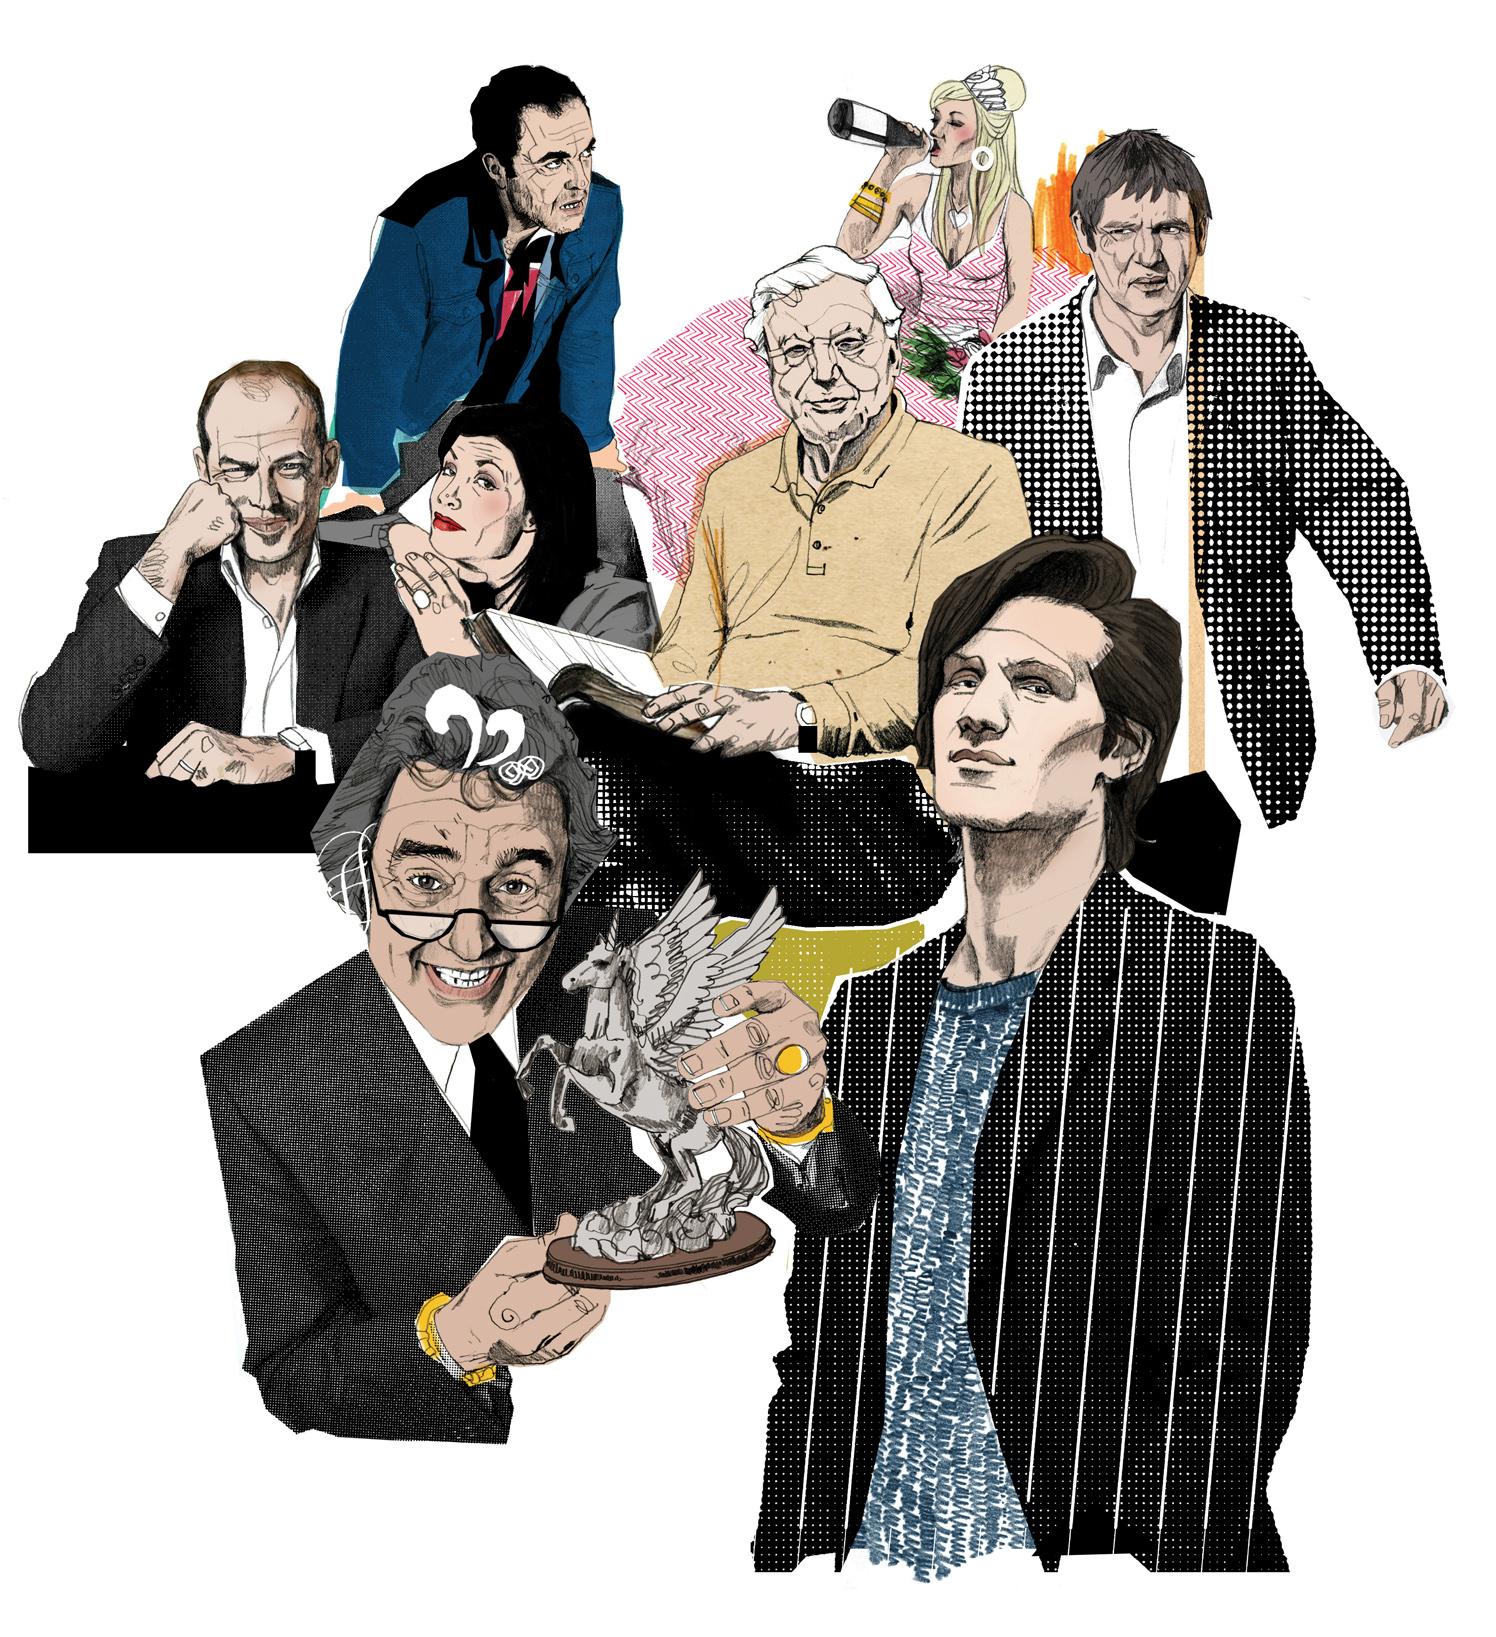 David and Friends / Televisual